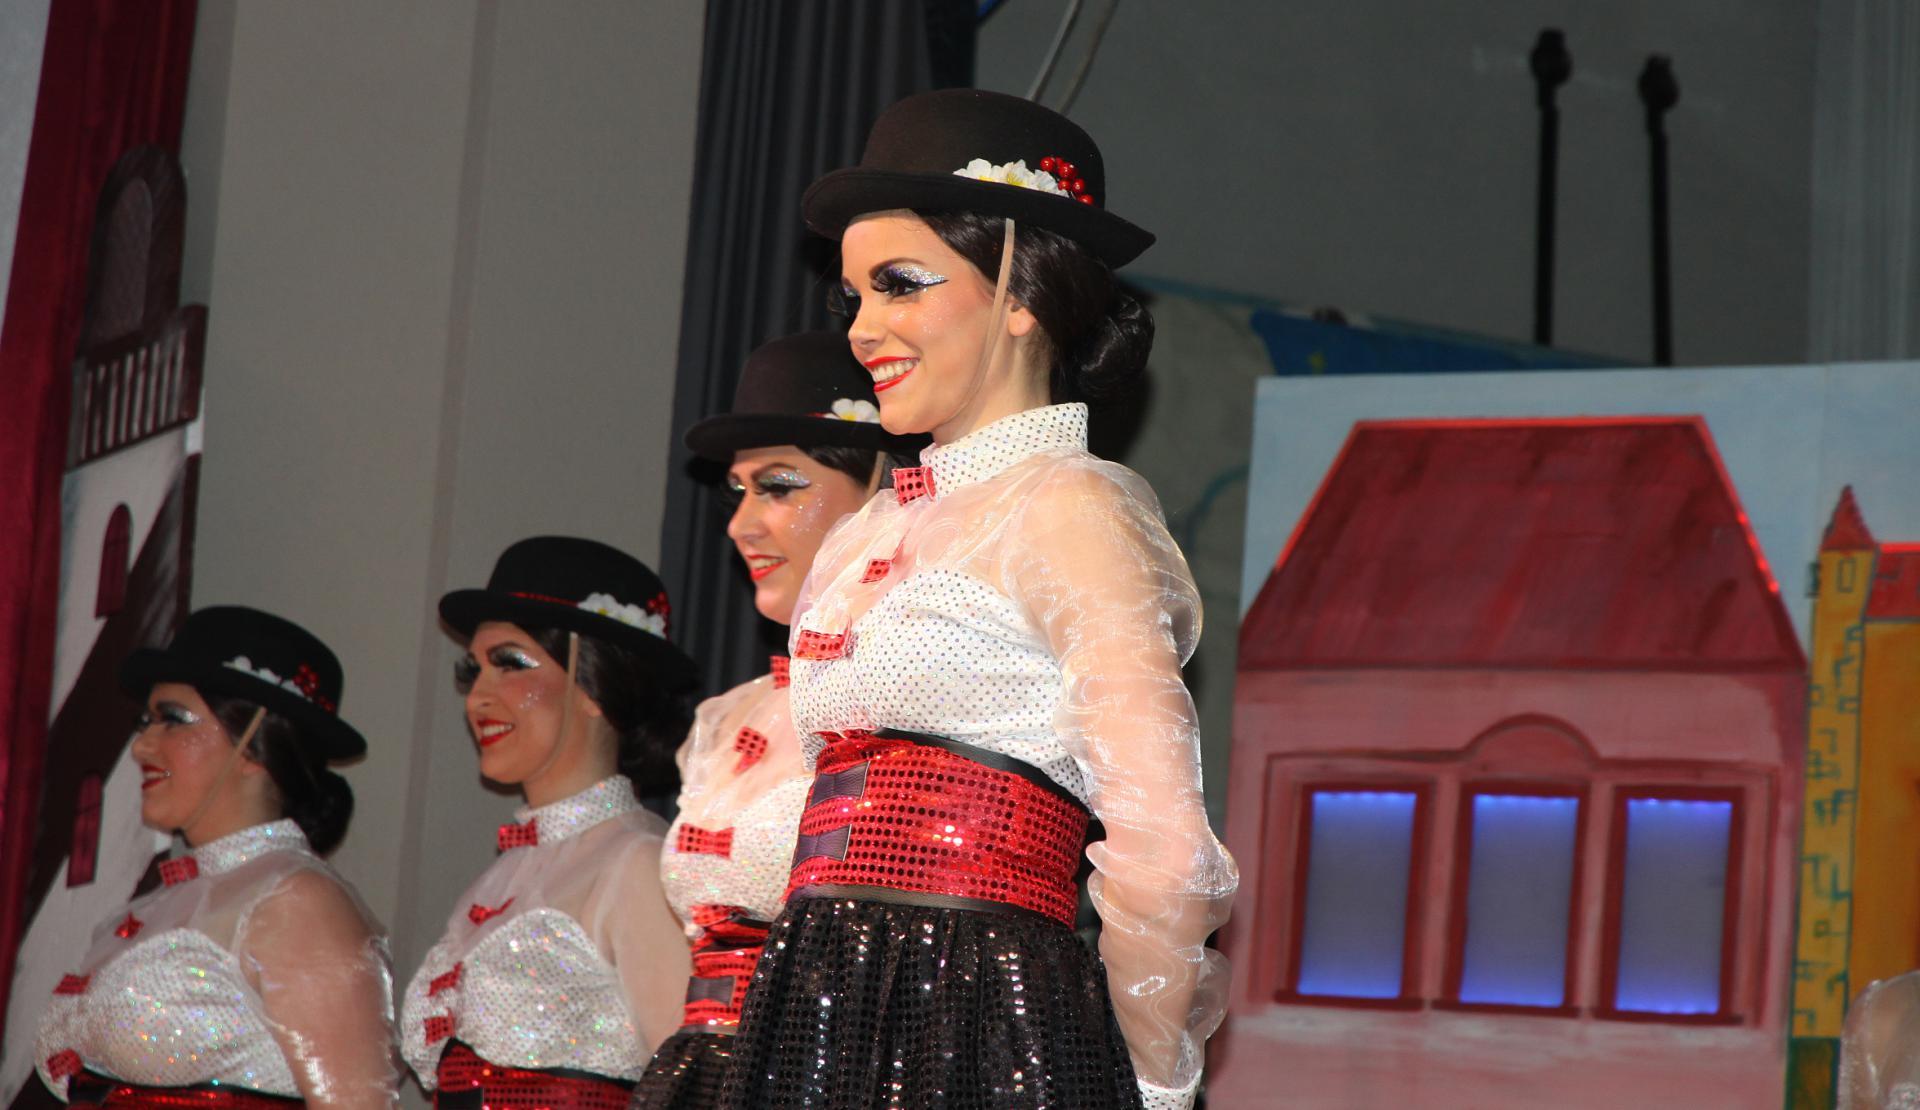 Showtanzgruppe - Sitzung Lengfurt 2017 10